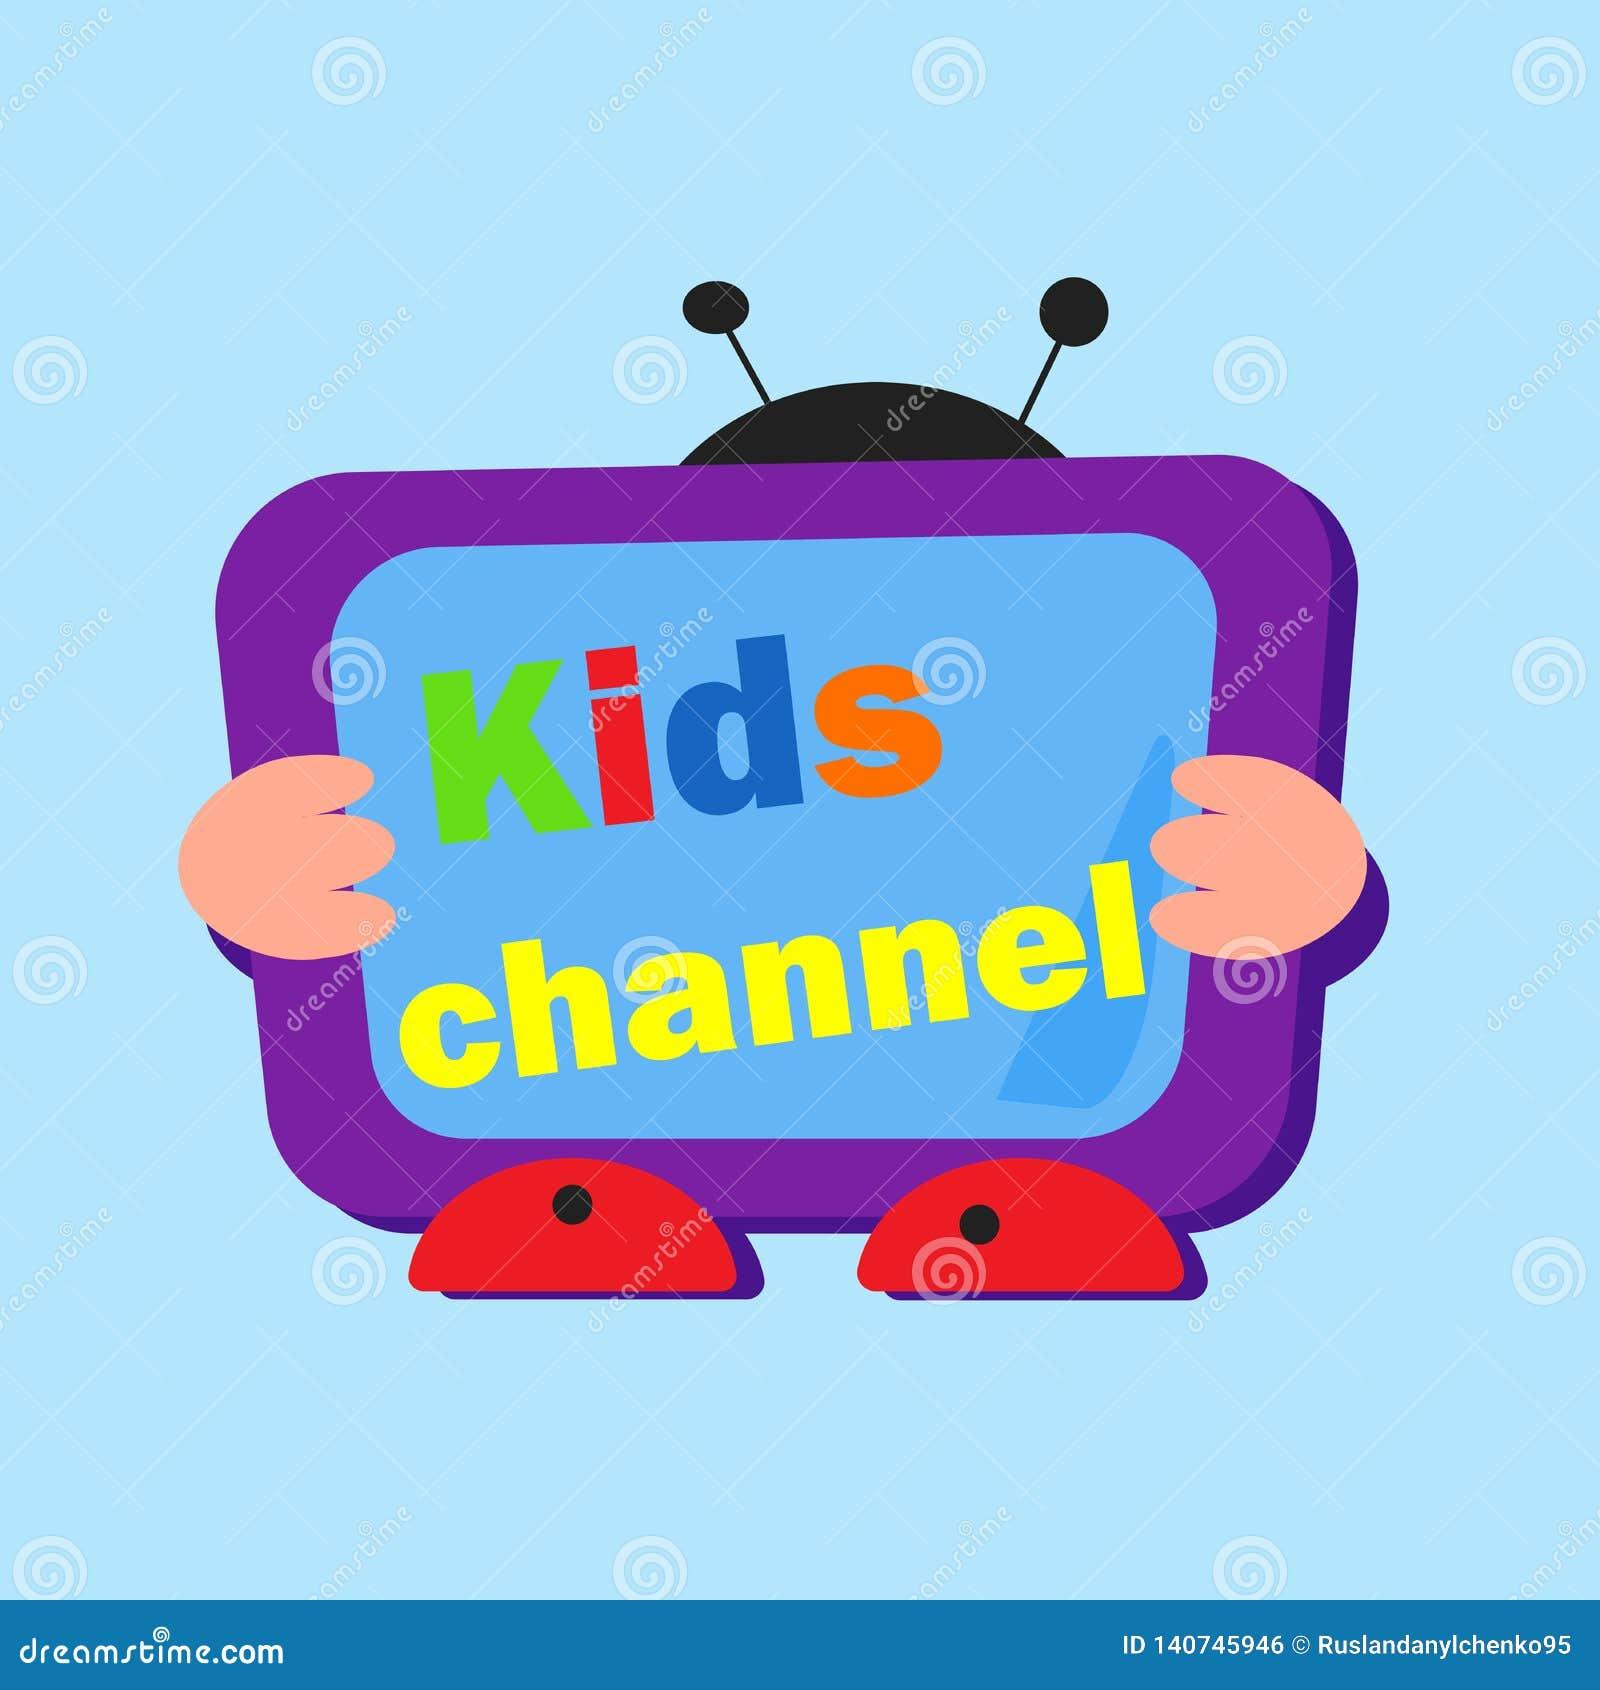 PrintLogo για την τηλεόραση των παιδιών διάνυσμα Φωτεινό λογότυπο με τις επιστολές και μια TV